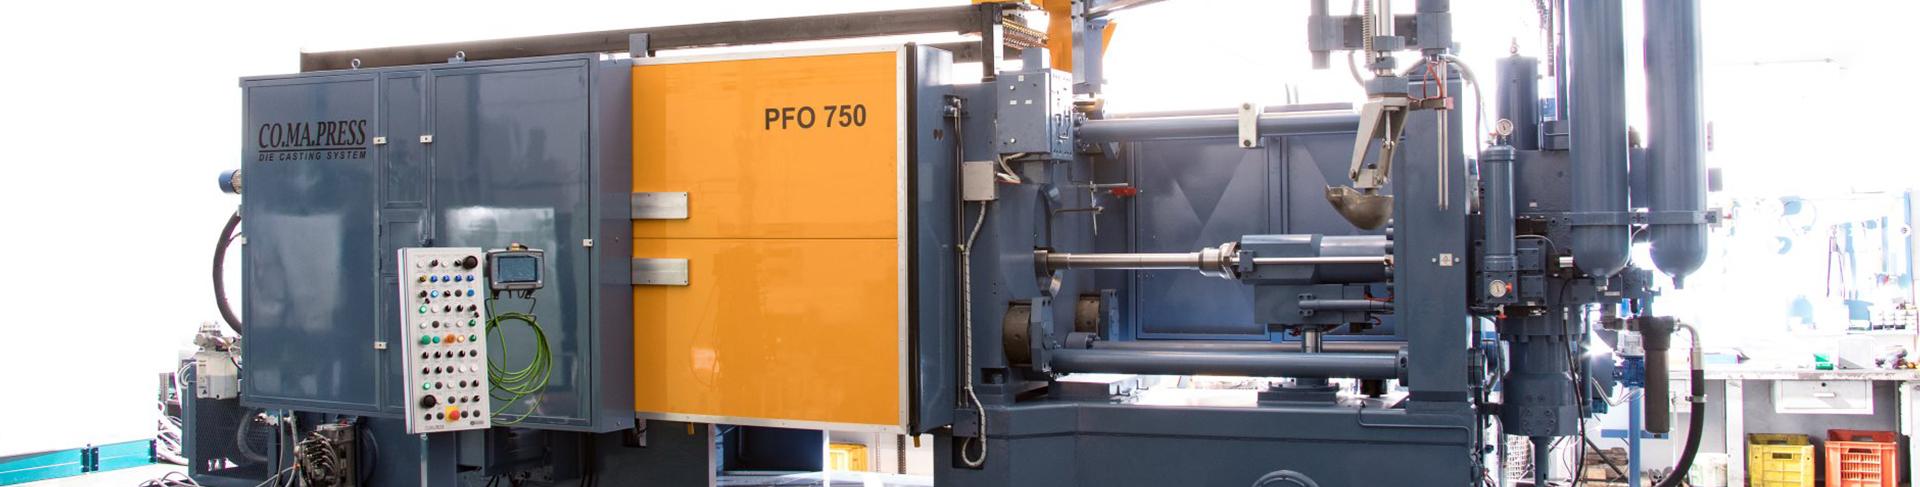 PFO750